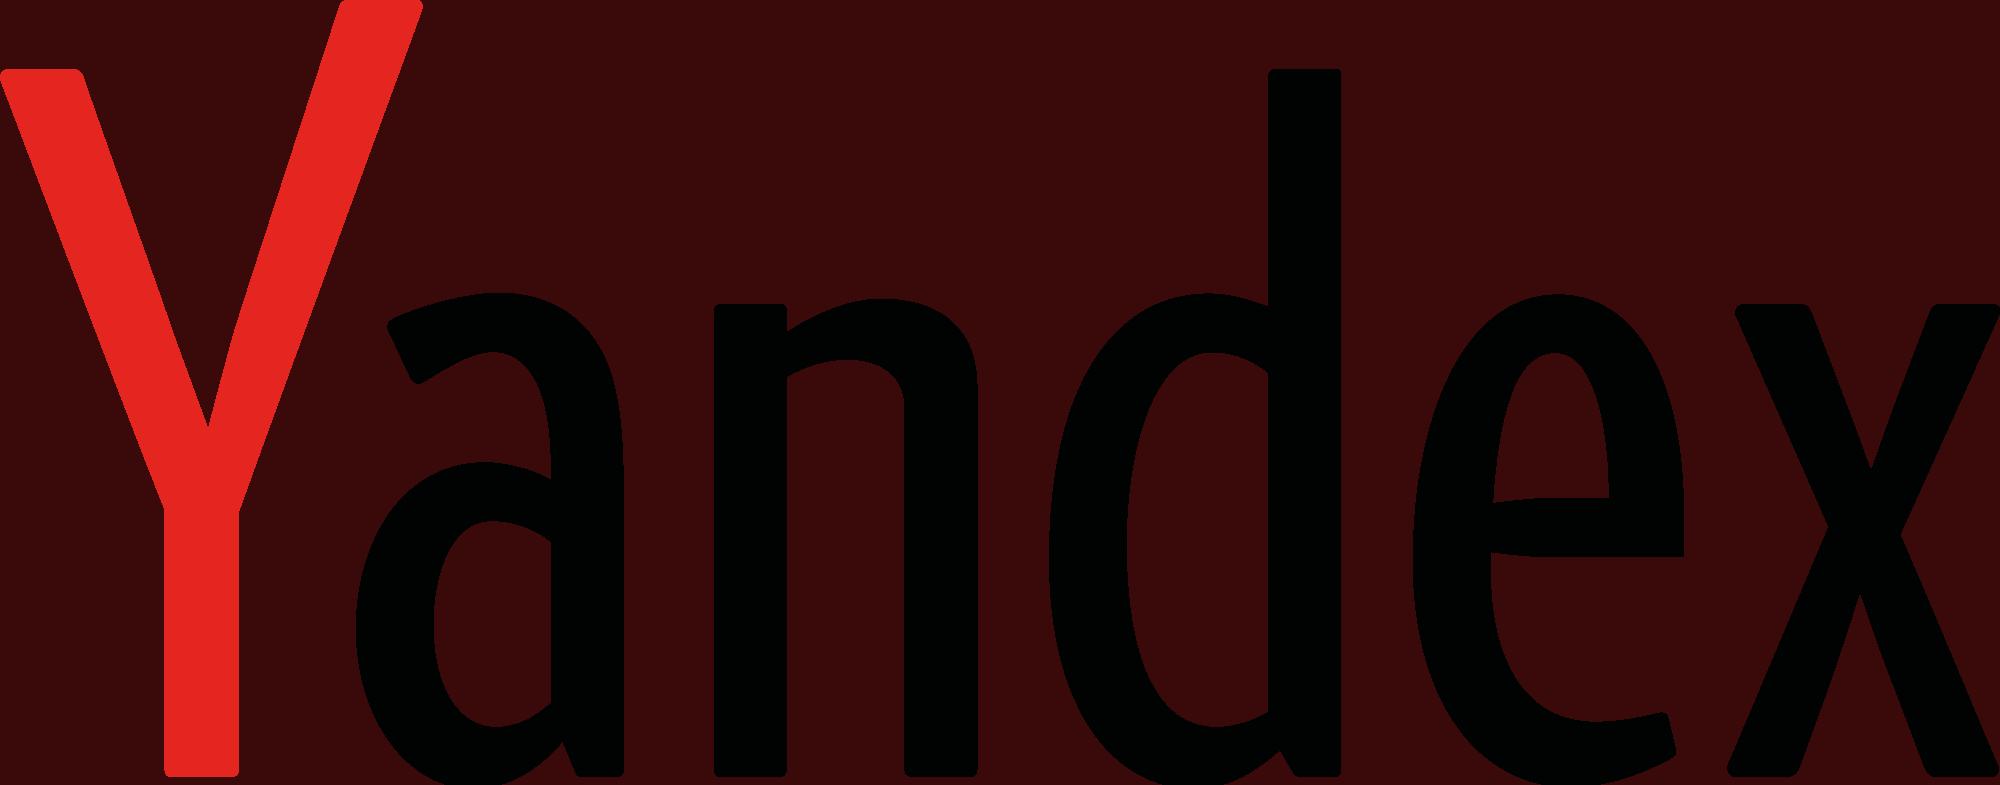 yandex_logo_en-svg